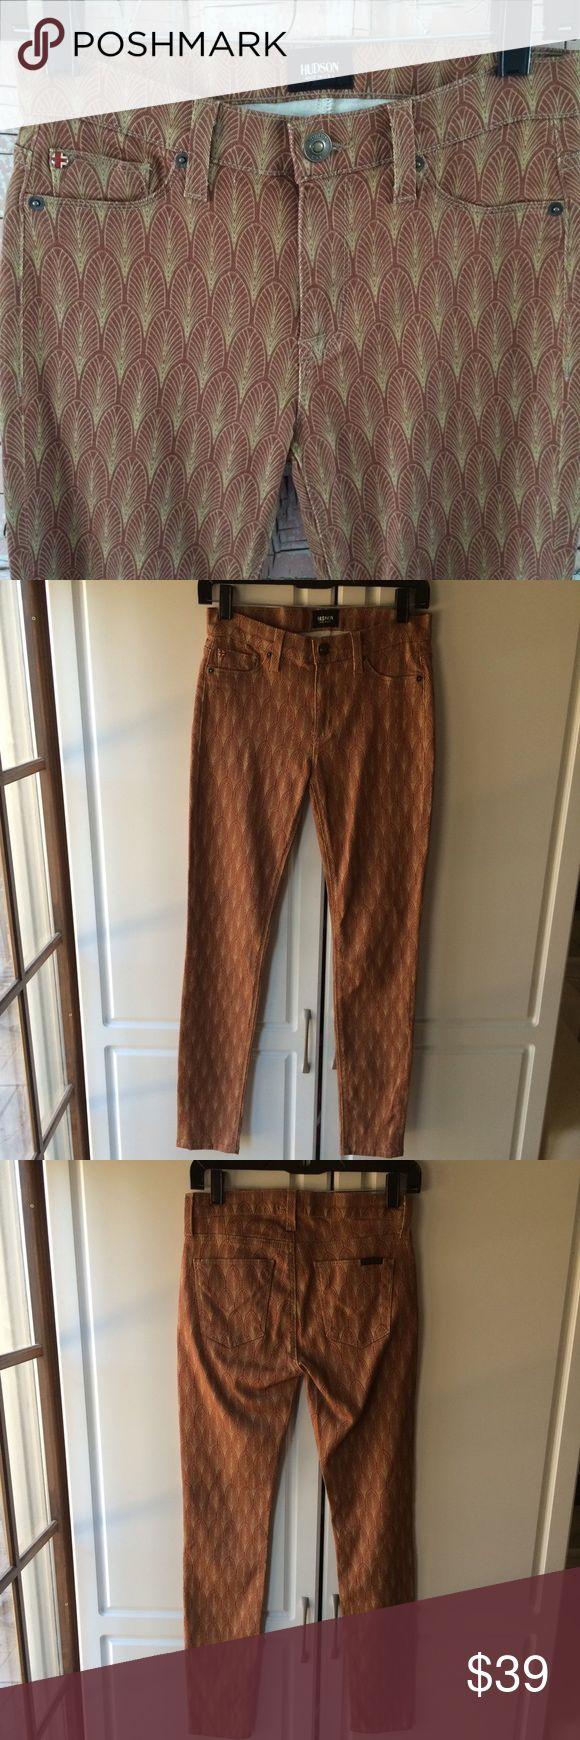 Hudson brown leaf print skinny jeans Excellent condition!  Size 26.  Cute for Spring! Hudson Jeans Jeans Skinny